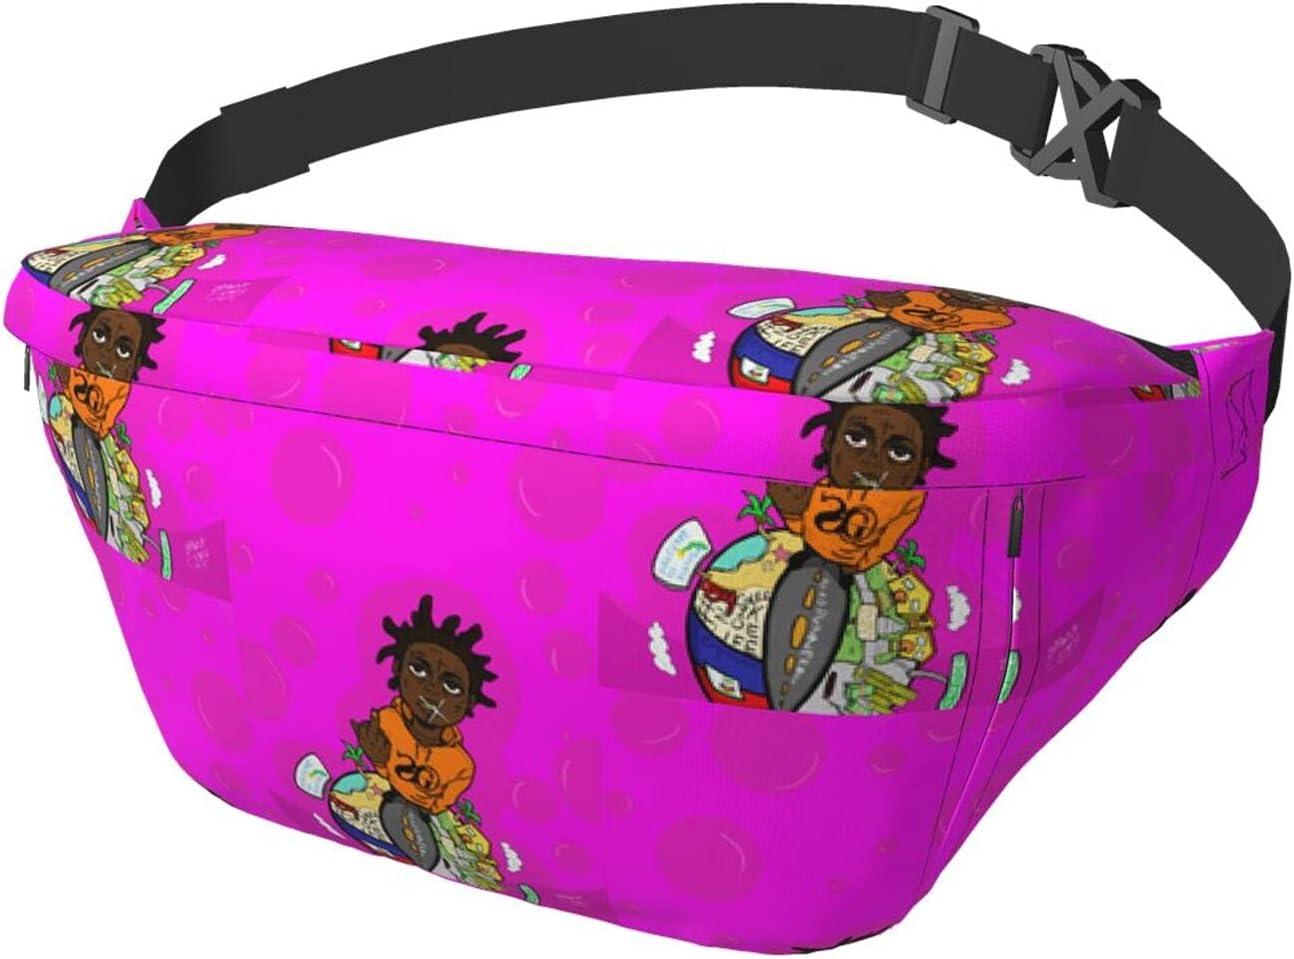 Free Kodak Superlatite Men'S Outdoor Chest Genuine Shipping Wai Sports Satchel